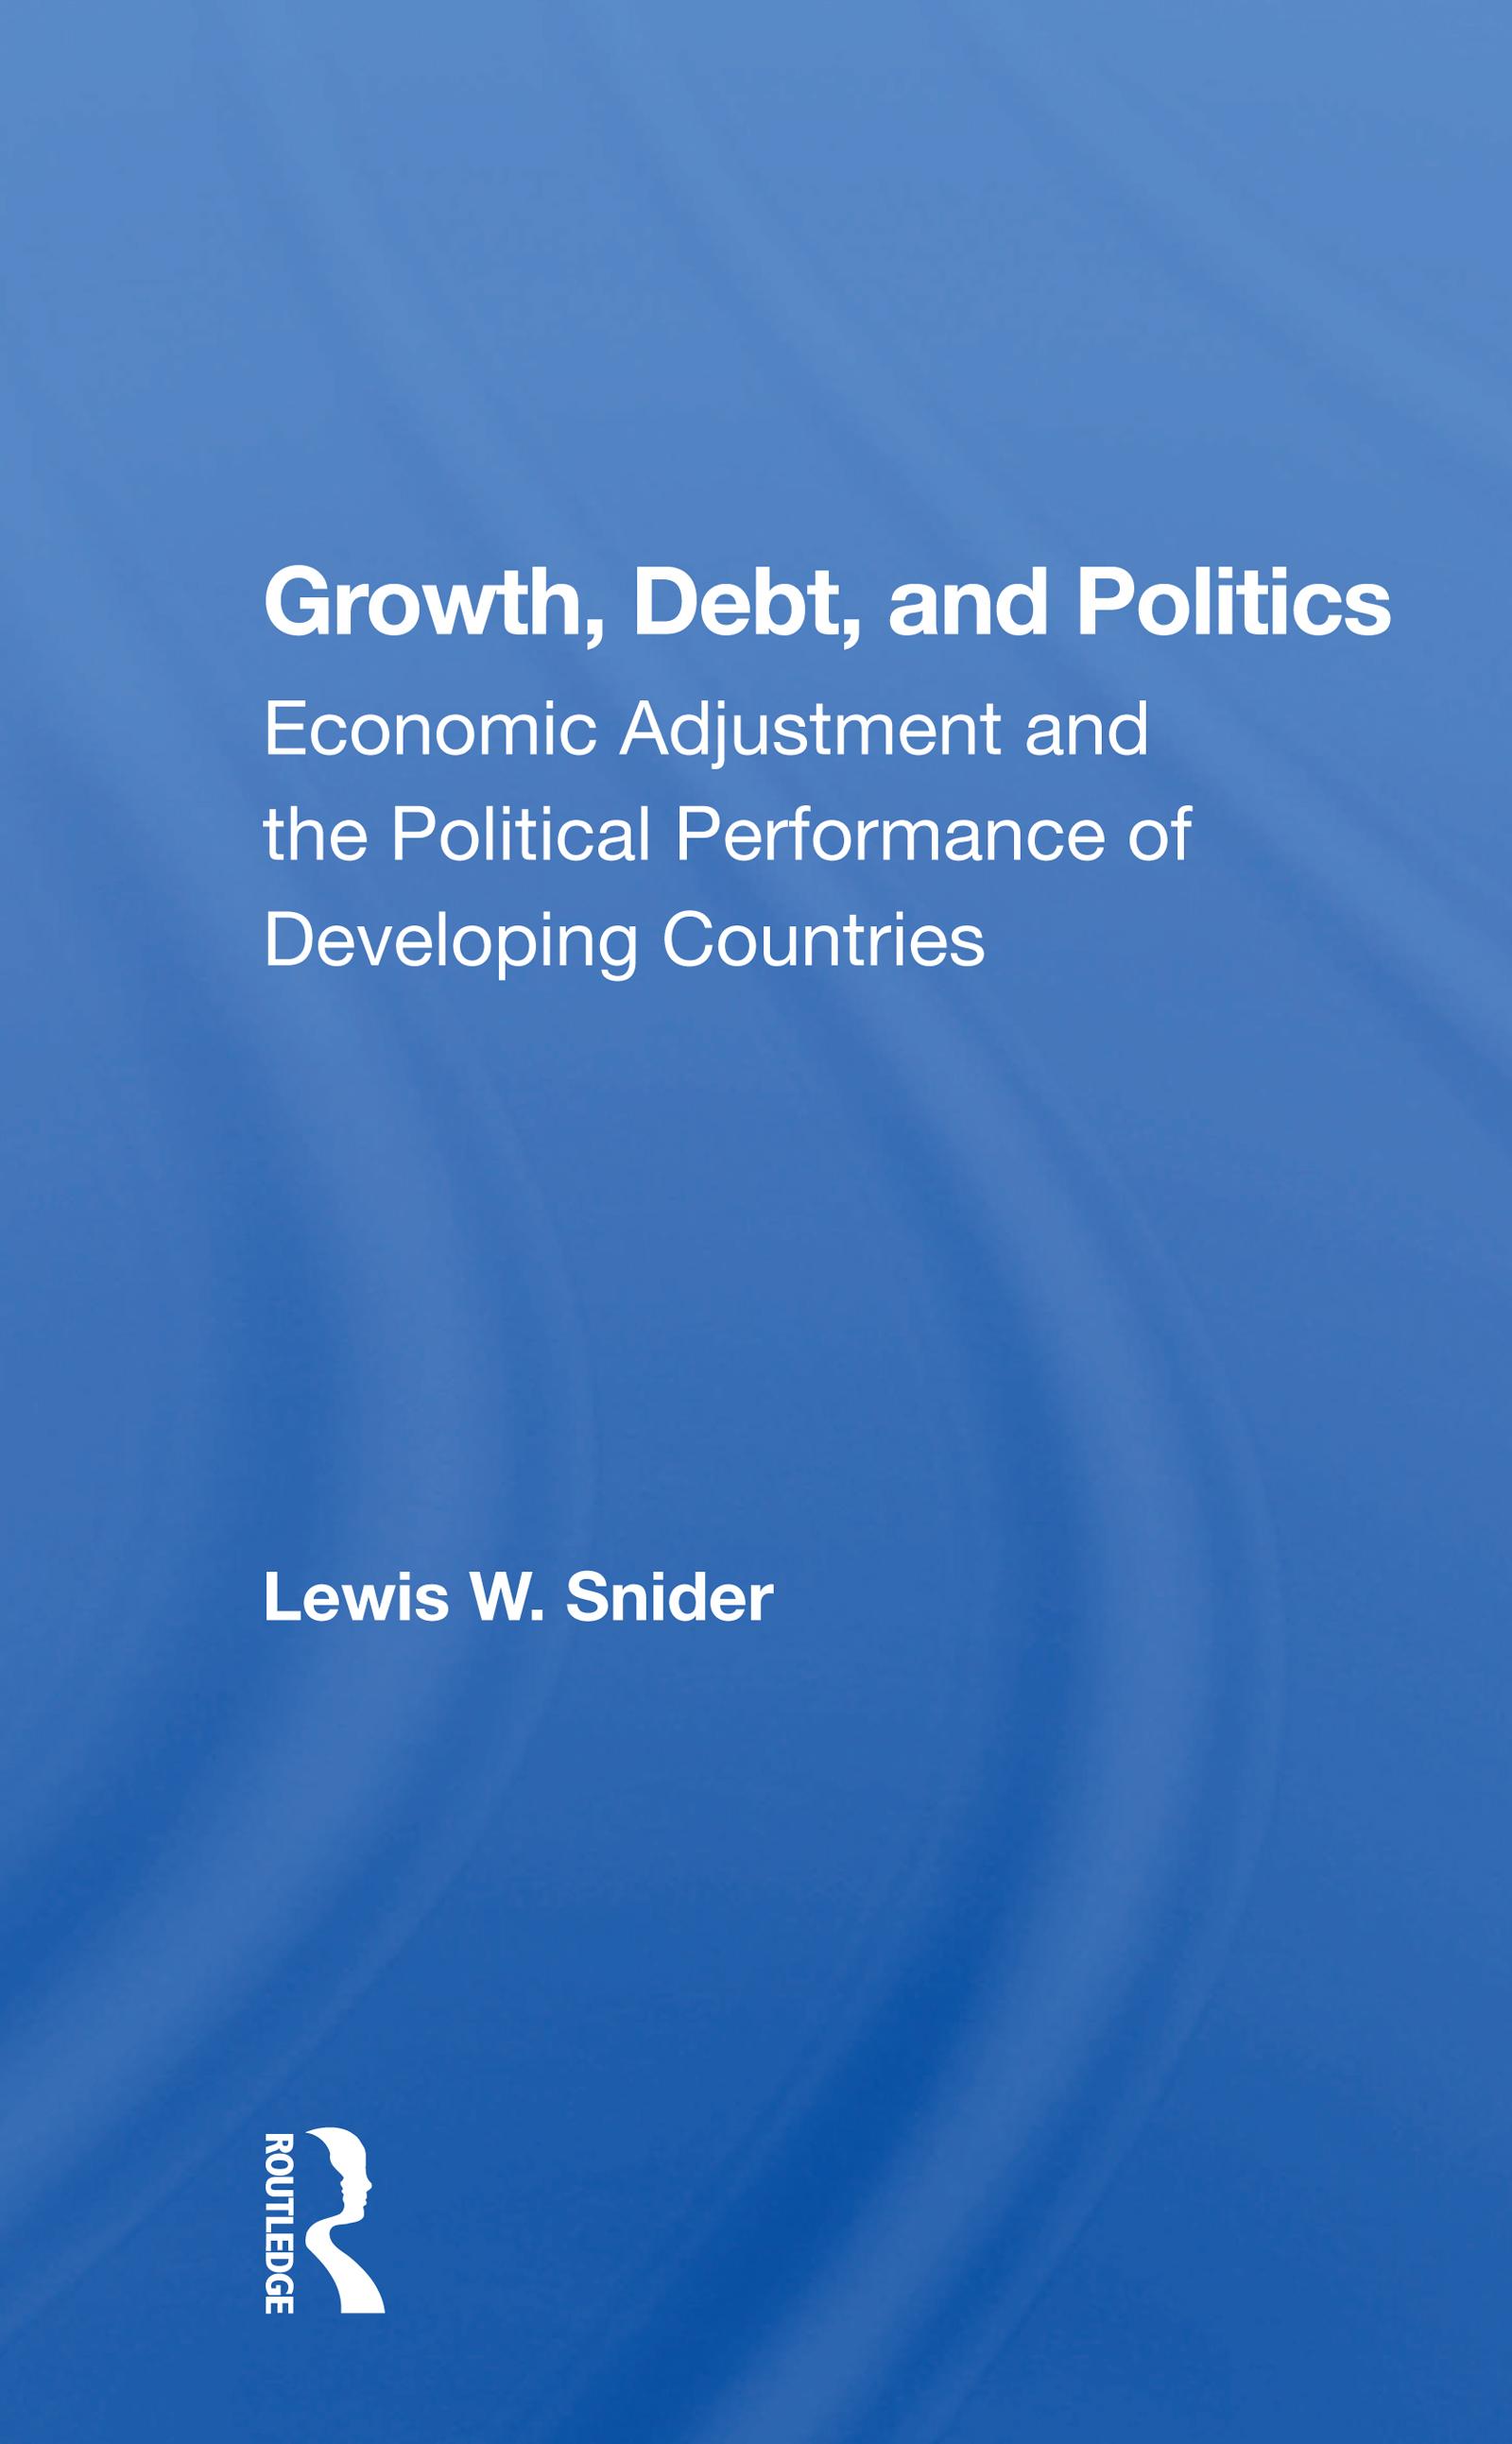 Growth, Debt, and Politics